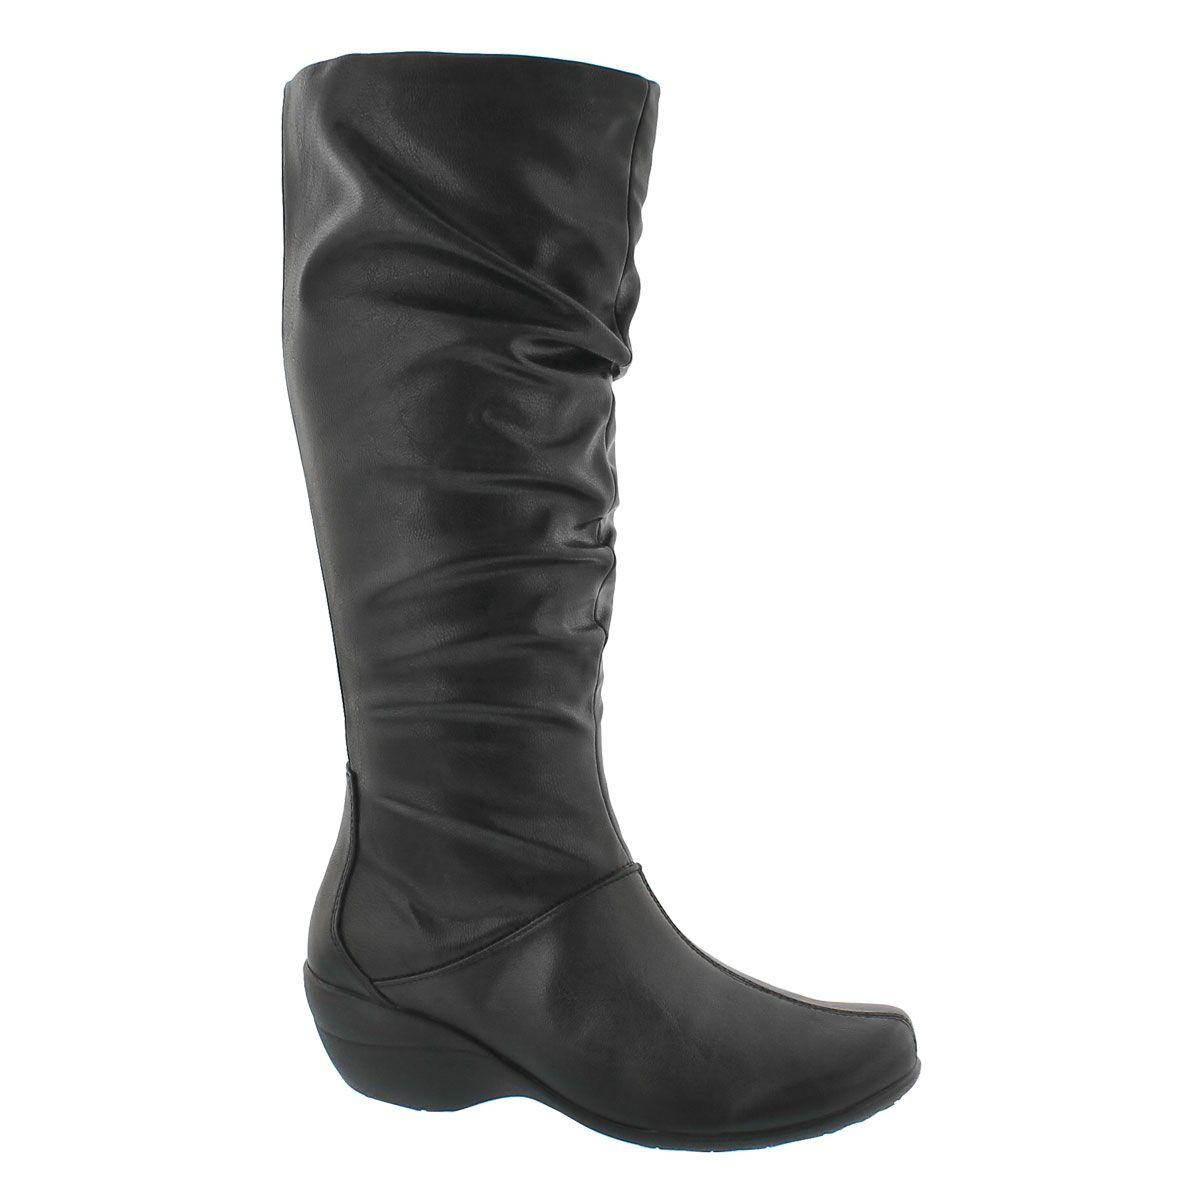 Lds Iva Kana IIV blk tall boot Boots, Dress with boots